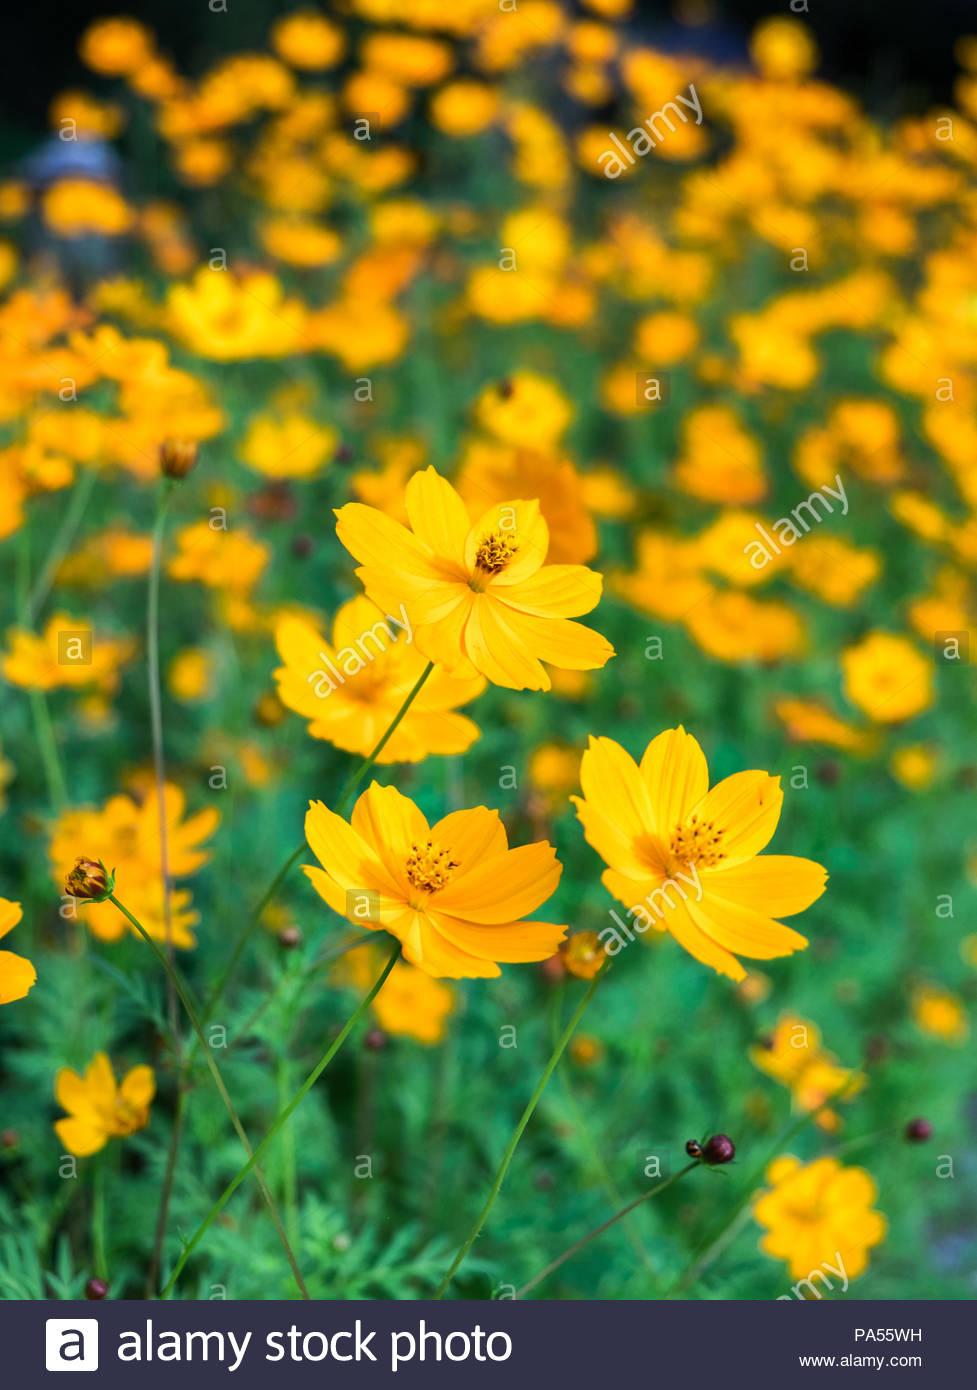 Orange yellow cosmos flower blooming in garden stock photo orange yellow cosmos flower blooming in garden mightylinksfo